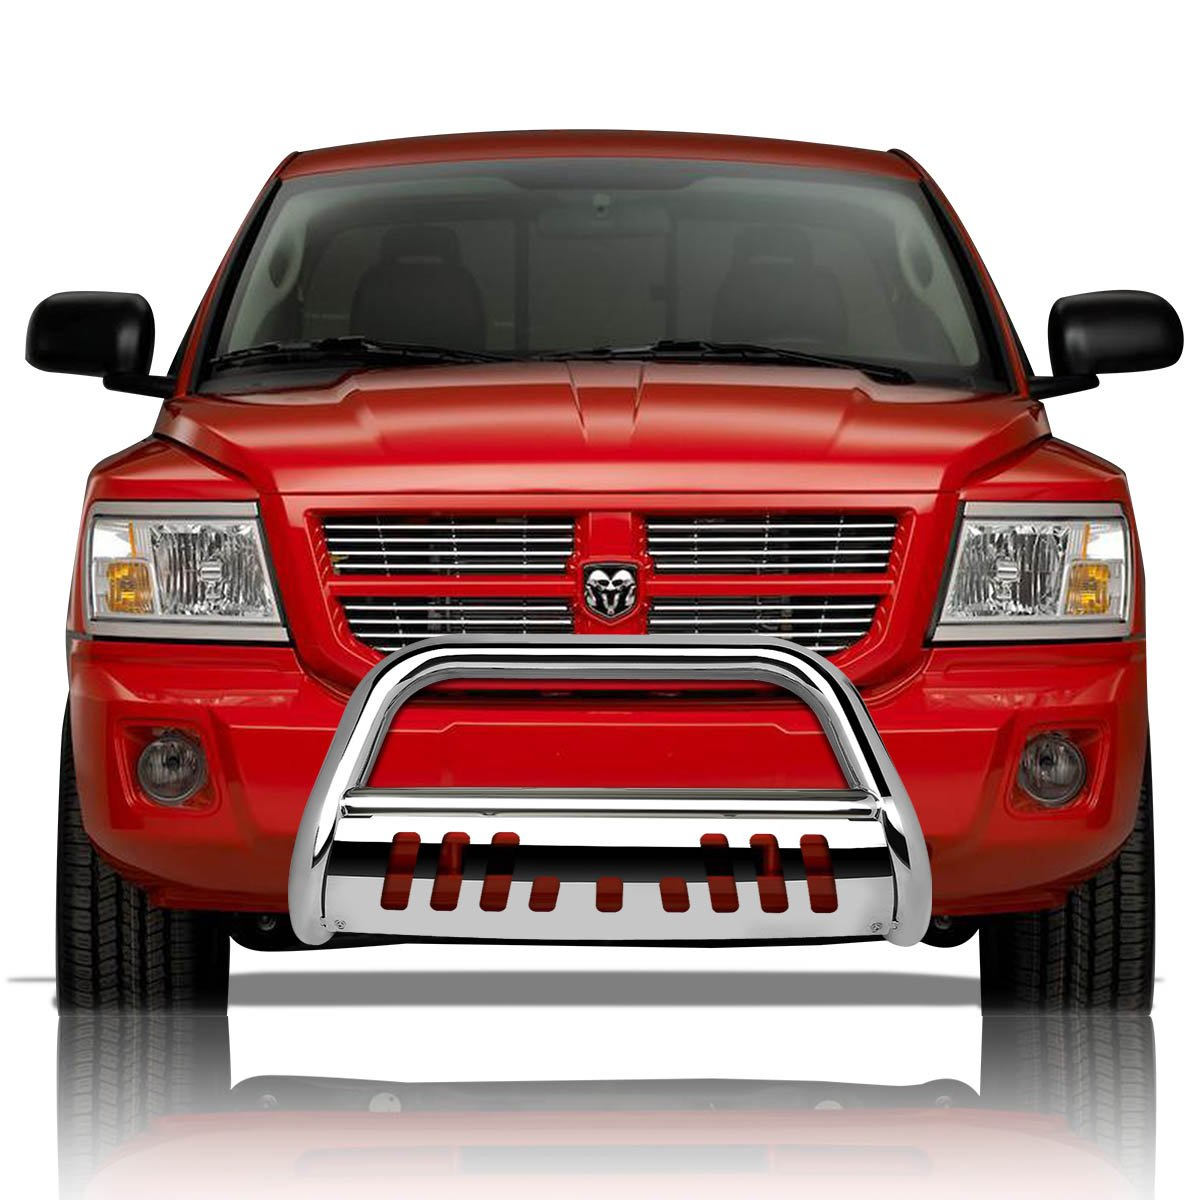 Black For Dodge Dakota 3 inches Bumper Push Bull Bar+Removable Skid Plate